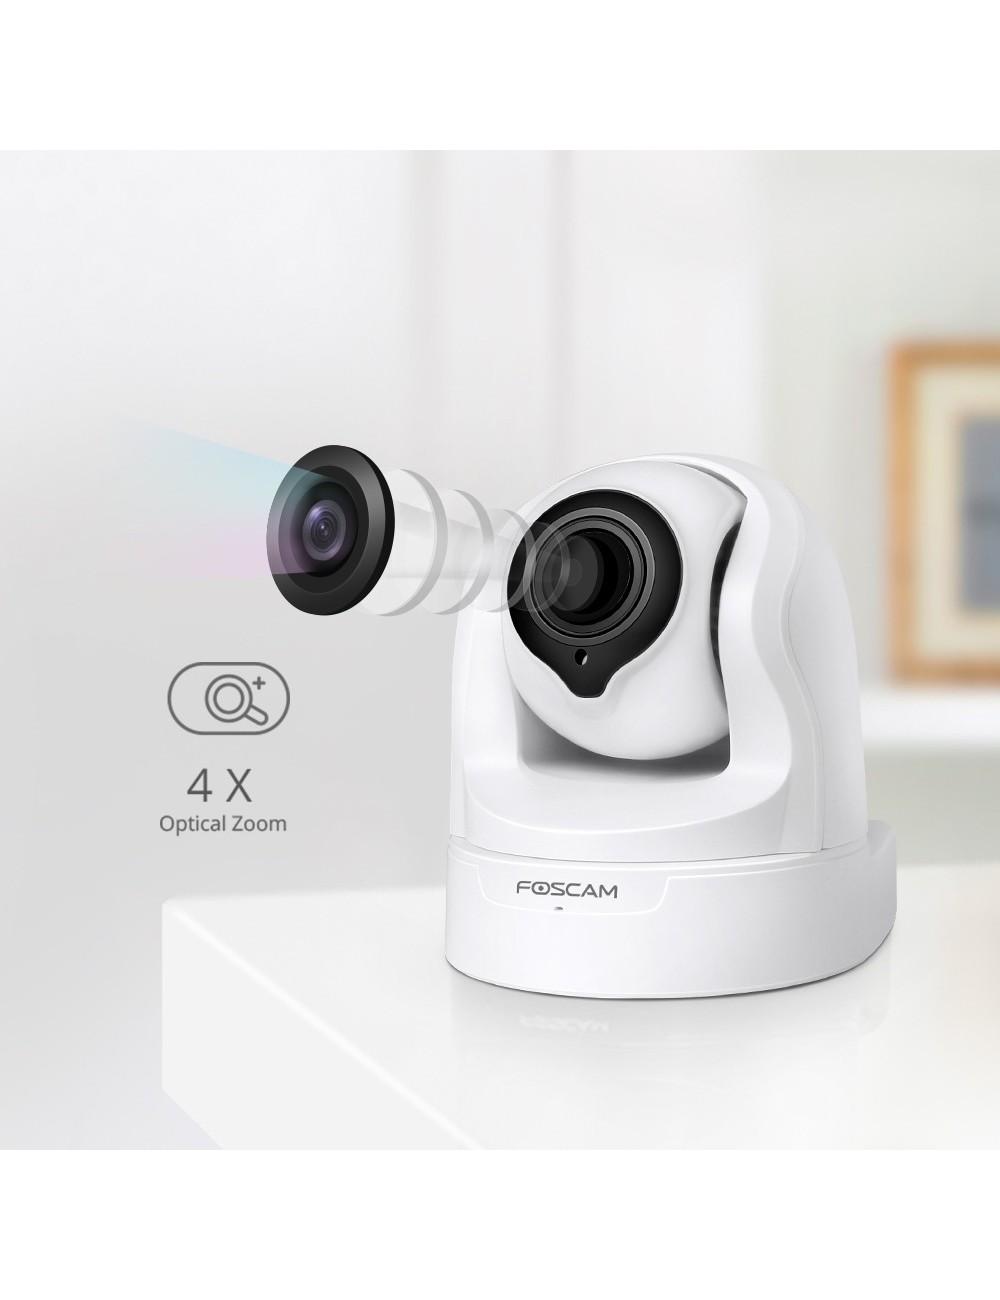 Foscam FI9926P - 2.0 Megapixel Camera